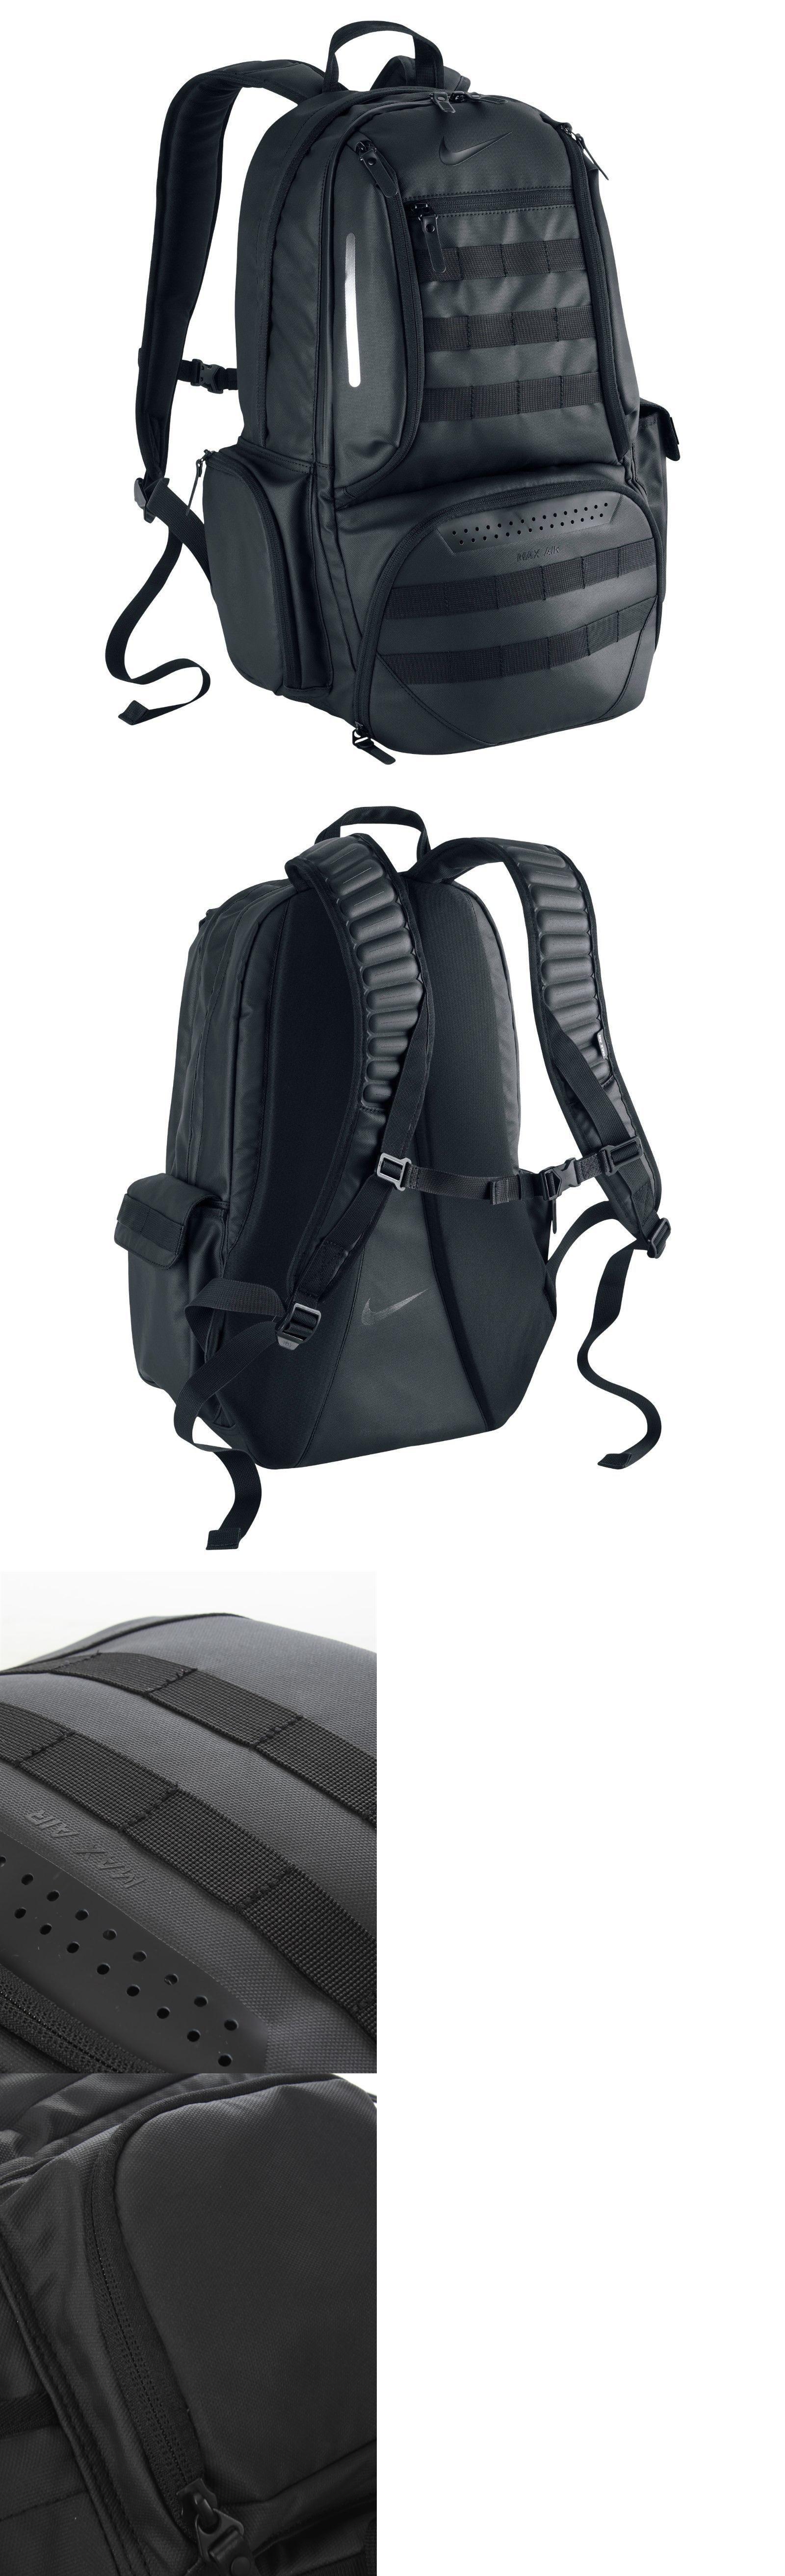 9d6aeabf1e33 ... Bags and Backpacks 163537 New Nike Ultimatum Max Air Shield Training  Large Black Backpack Ba4761 . ...